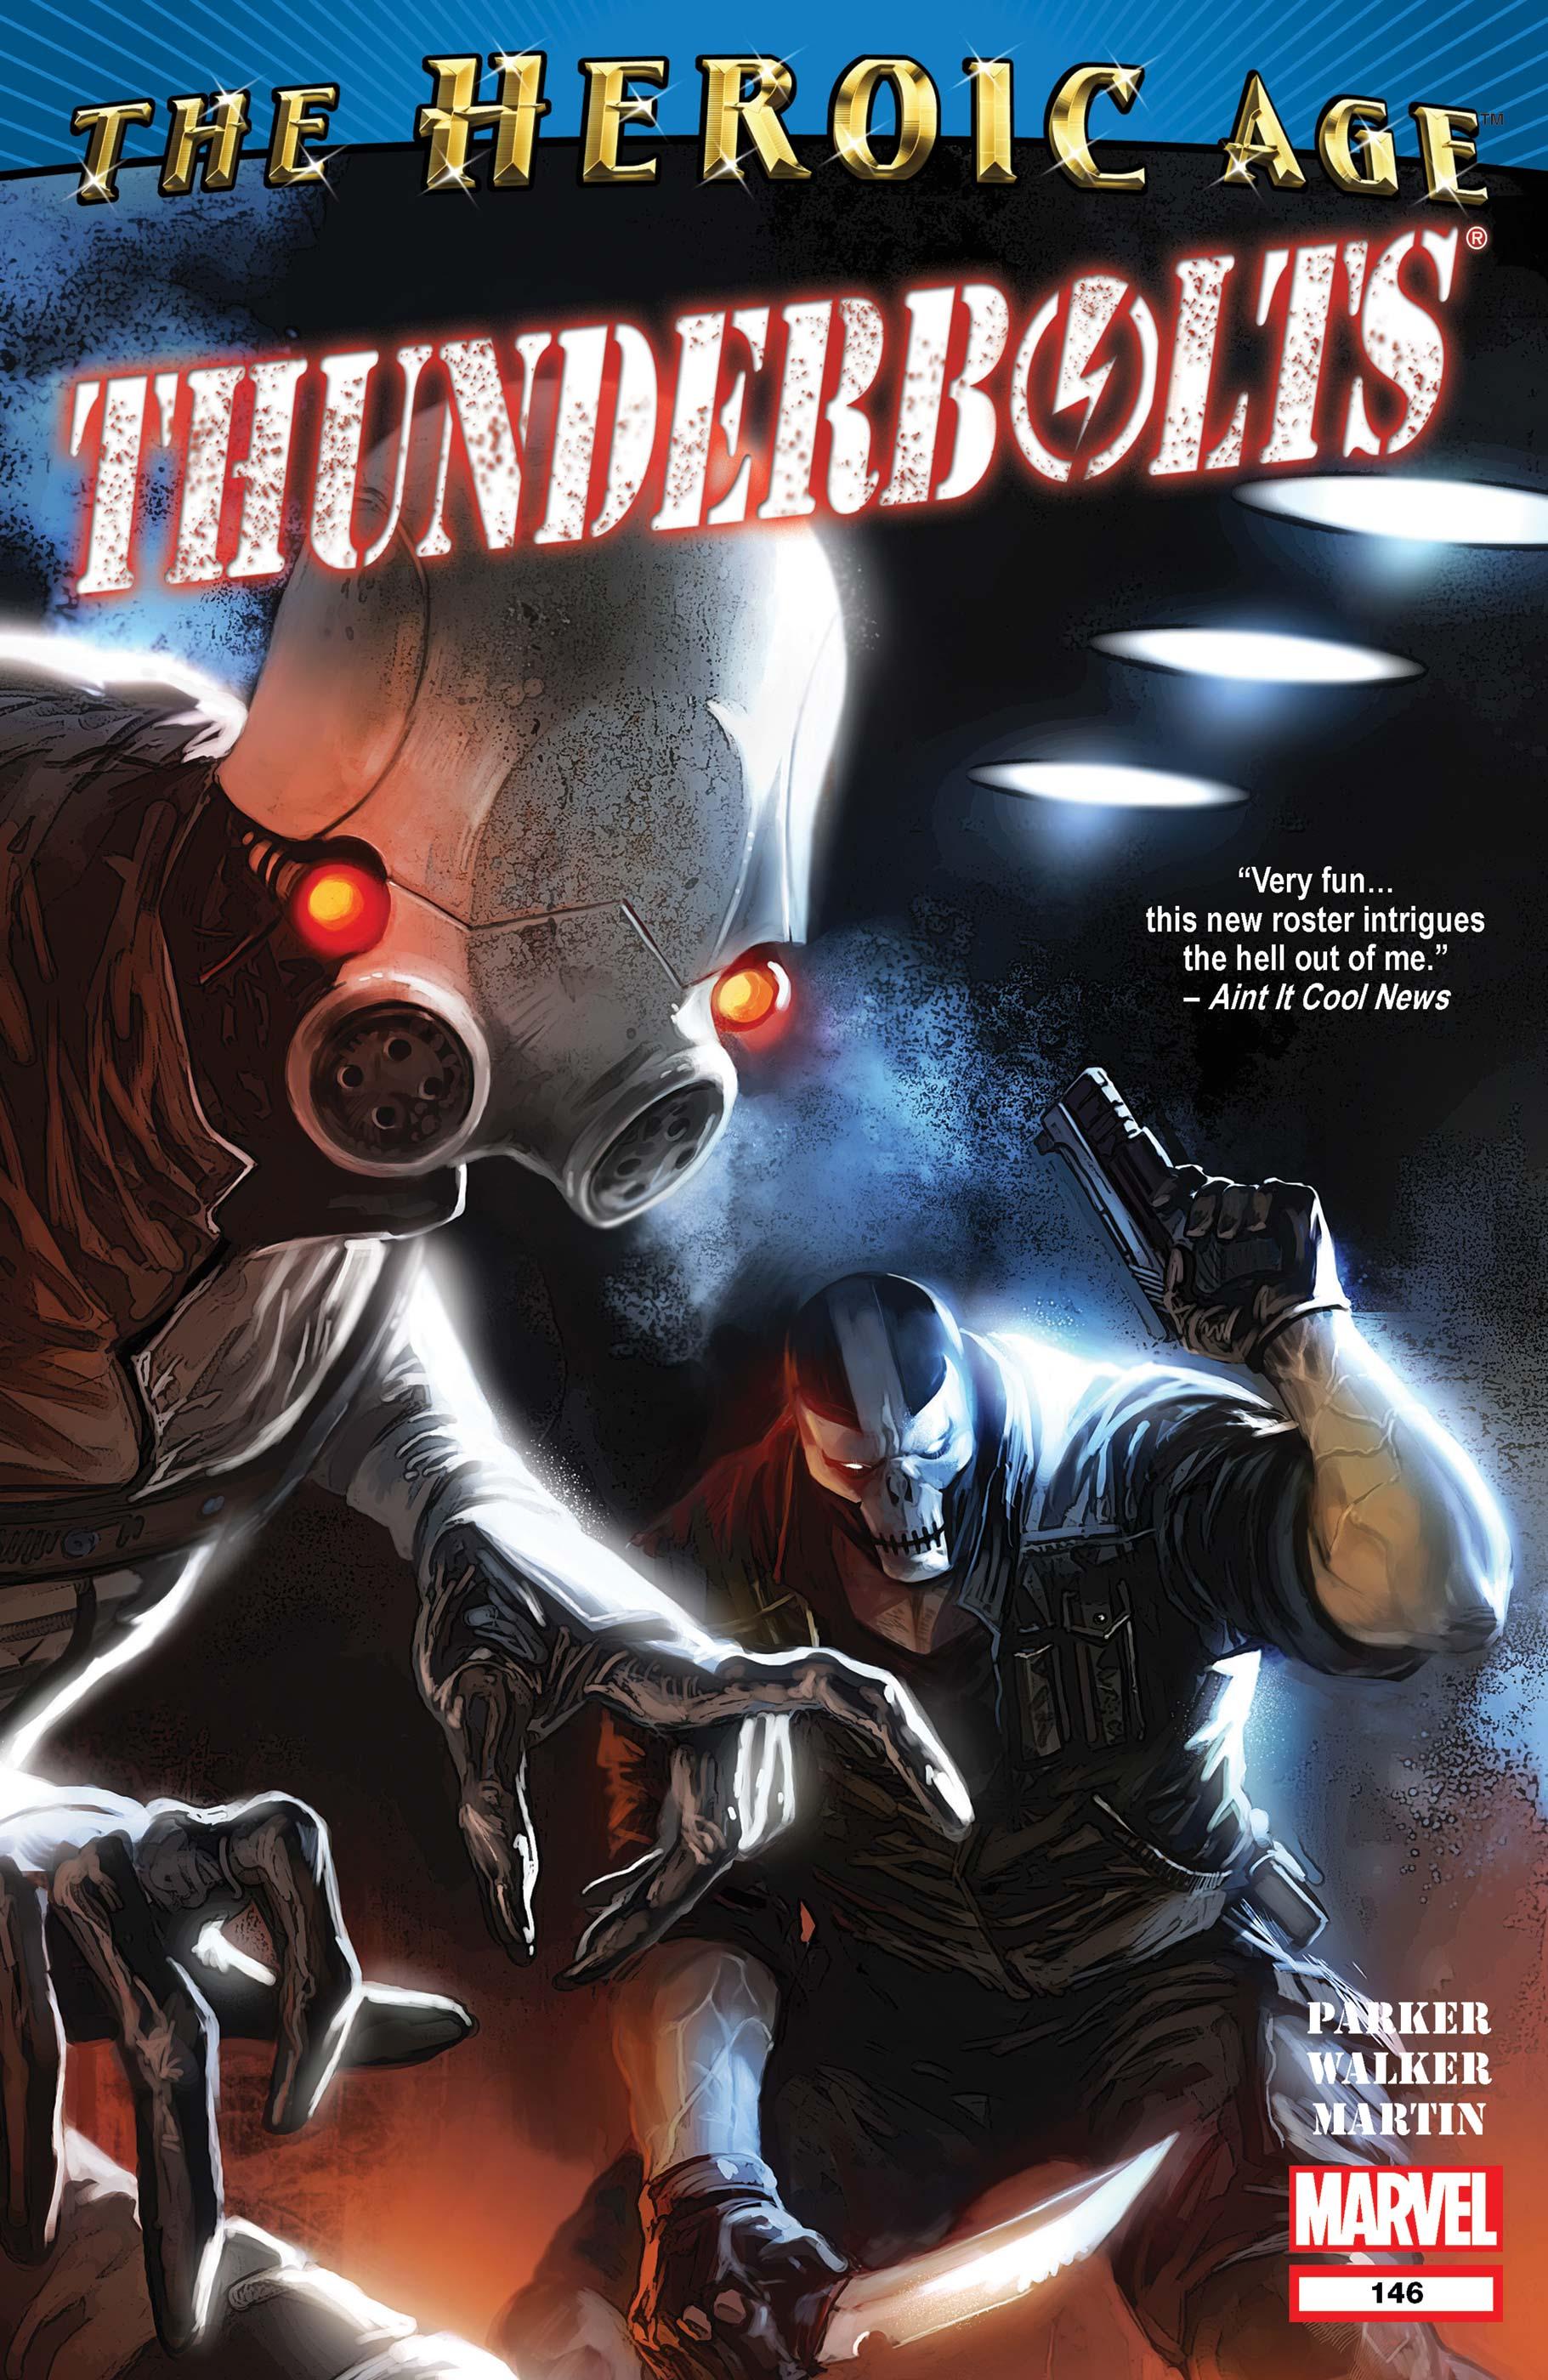 Thunderbolts (2006) #146